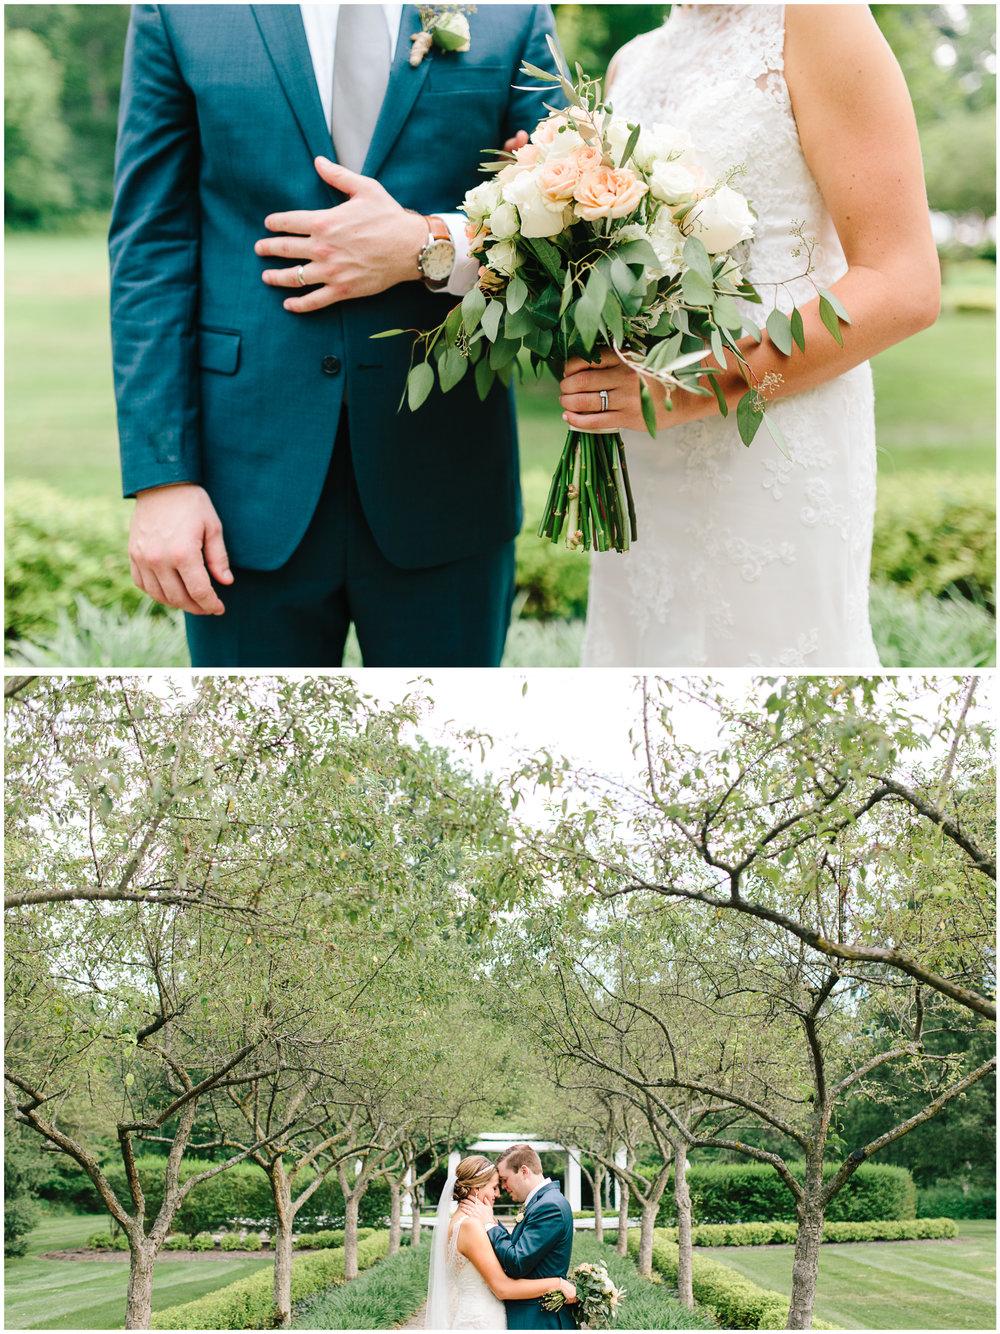 ann_arbor_michigan_wedding_46.jpg